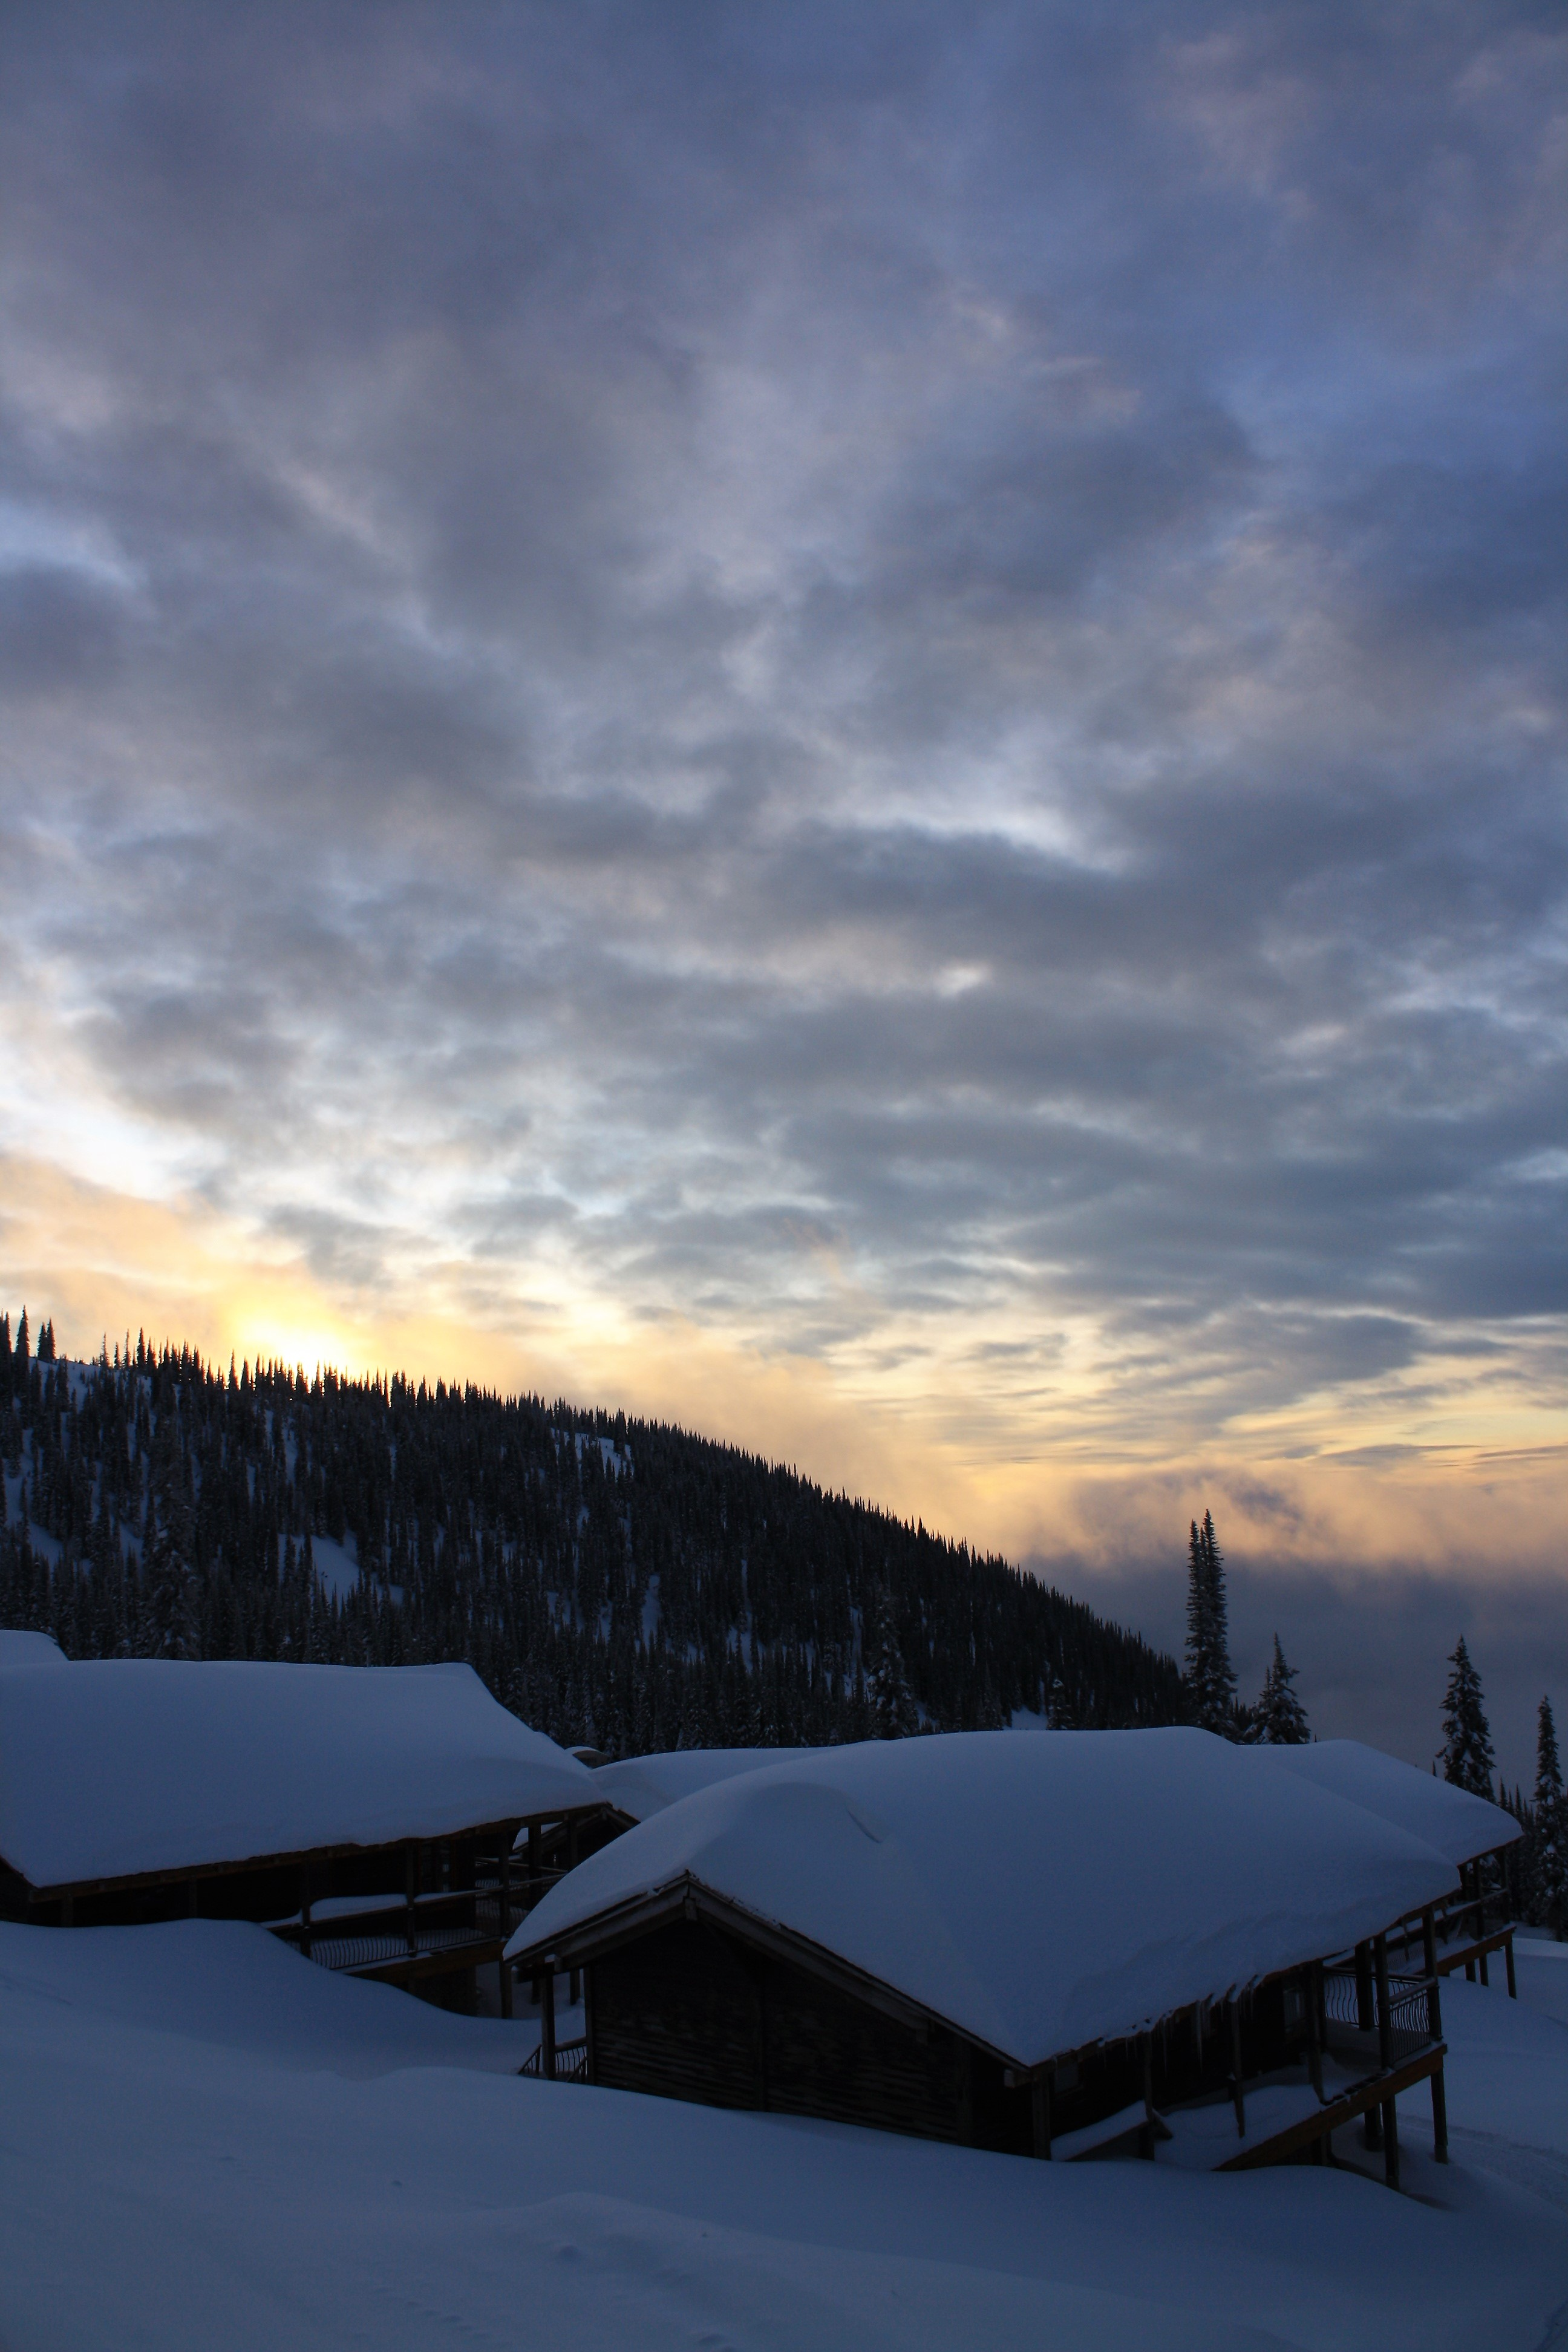 DM_nature_winter_kootenays_1755